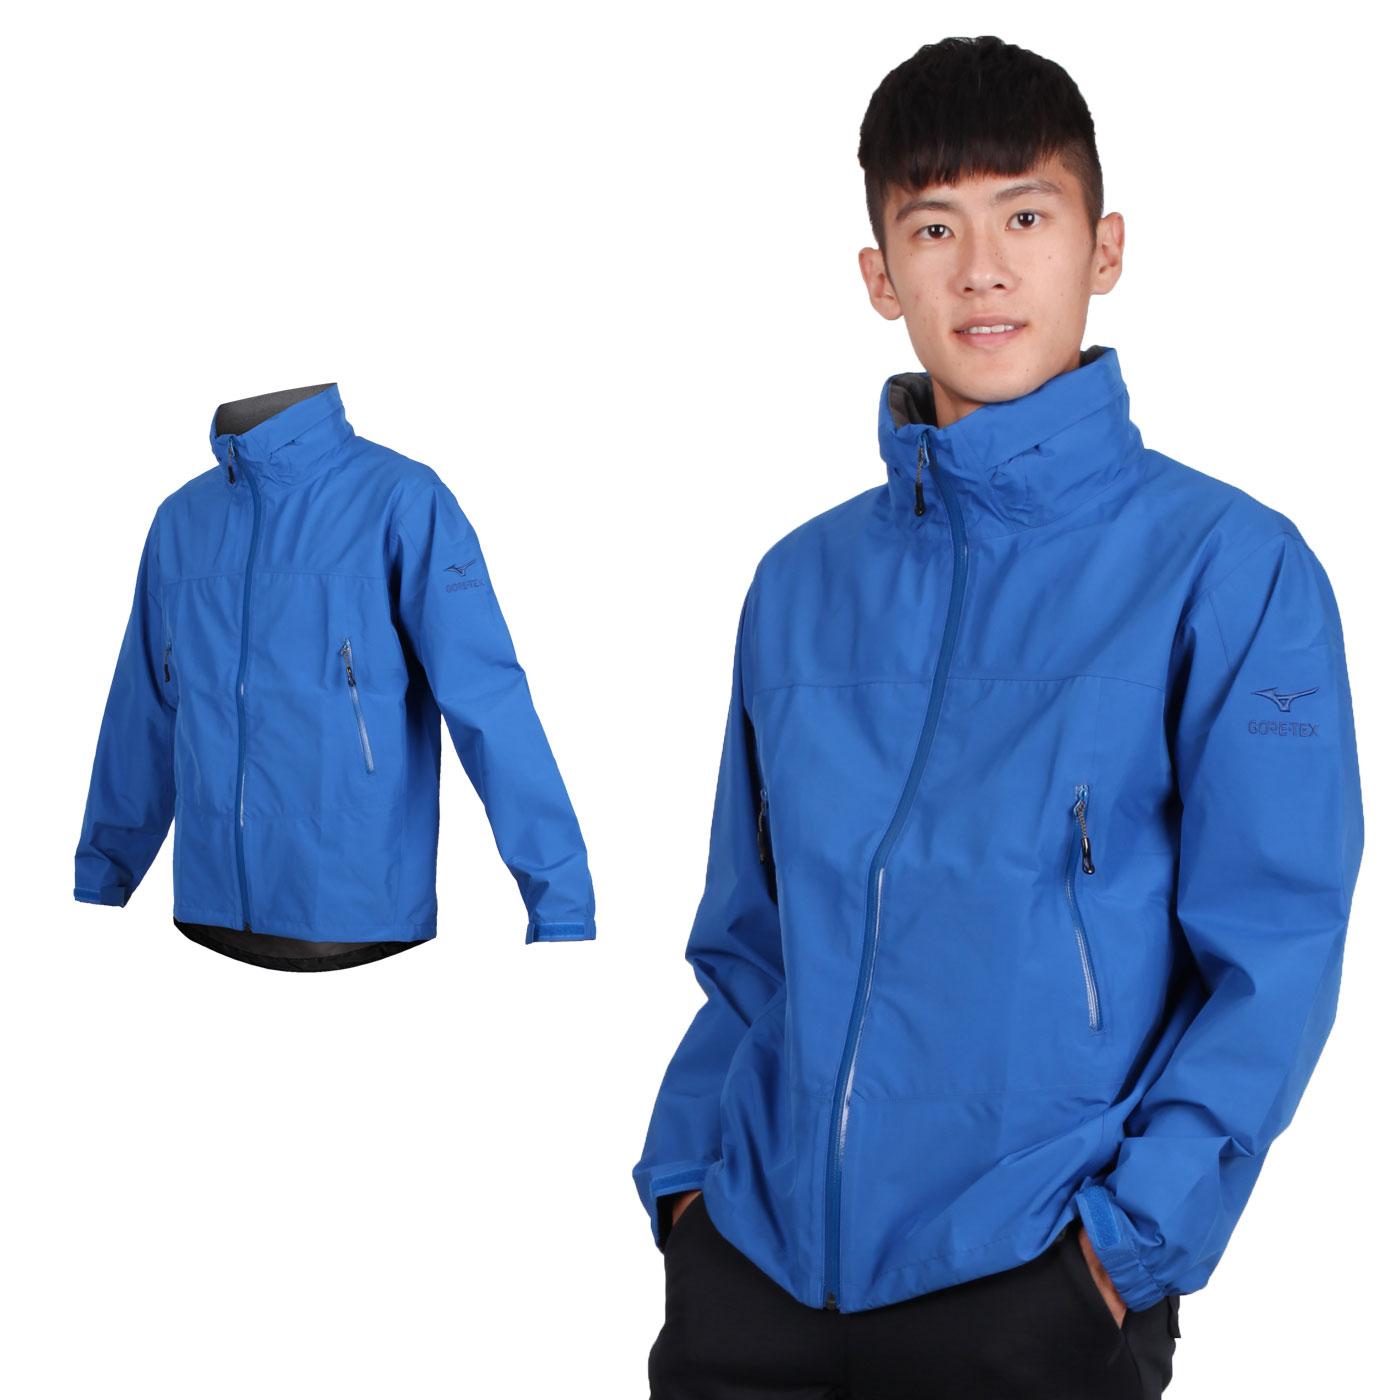 MIZUNO 男款GORE-TEX防風防水外套 B2JE9W1009 - 藍